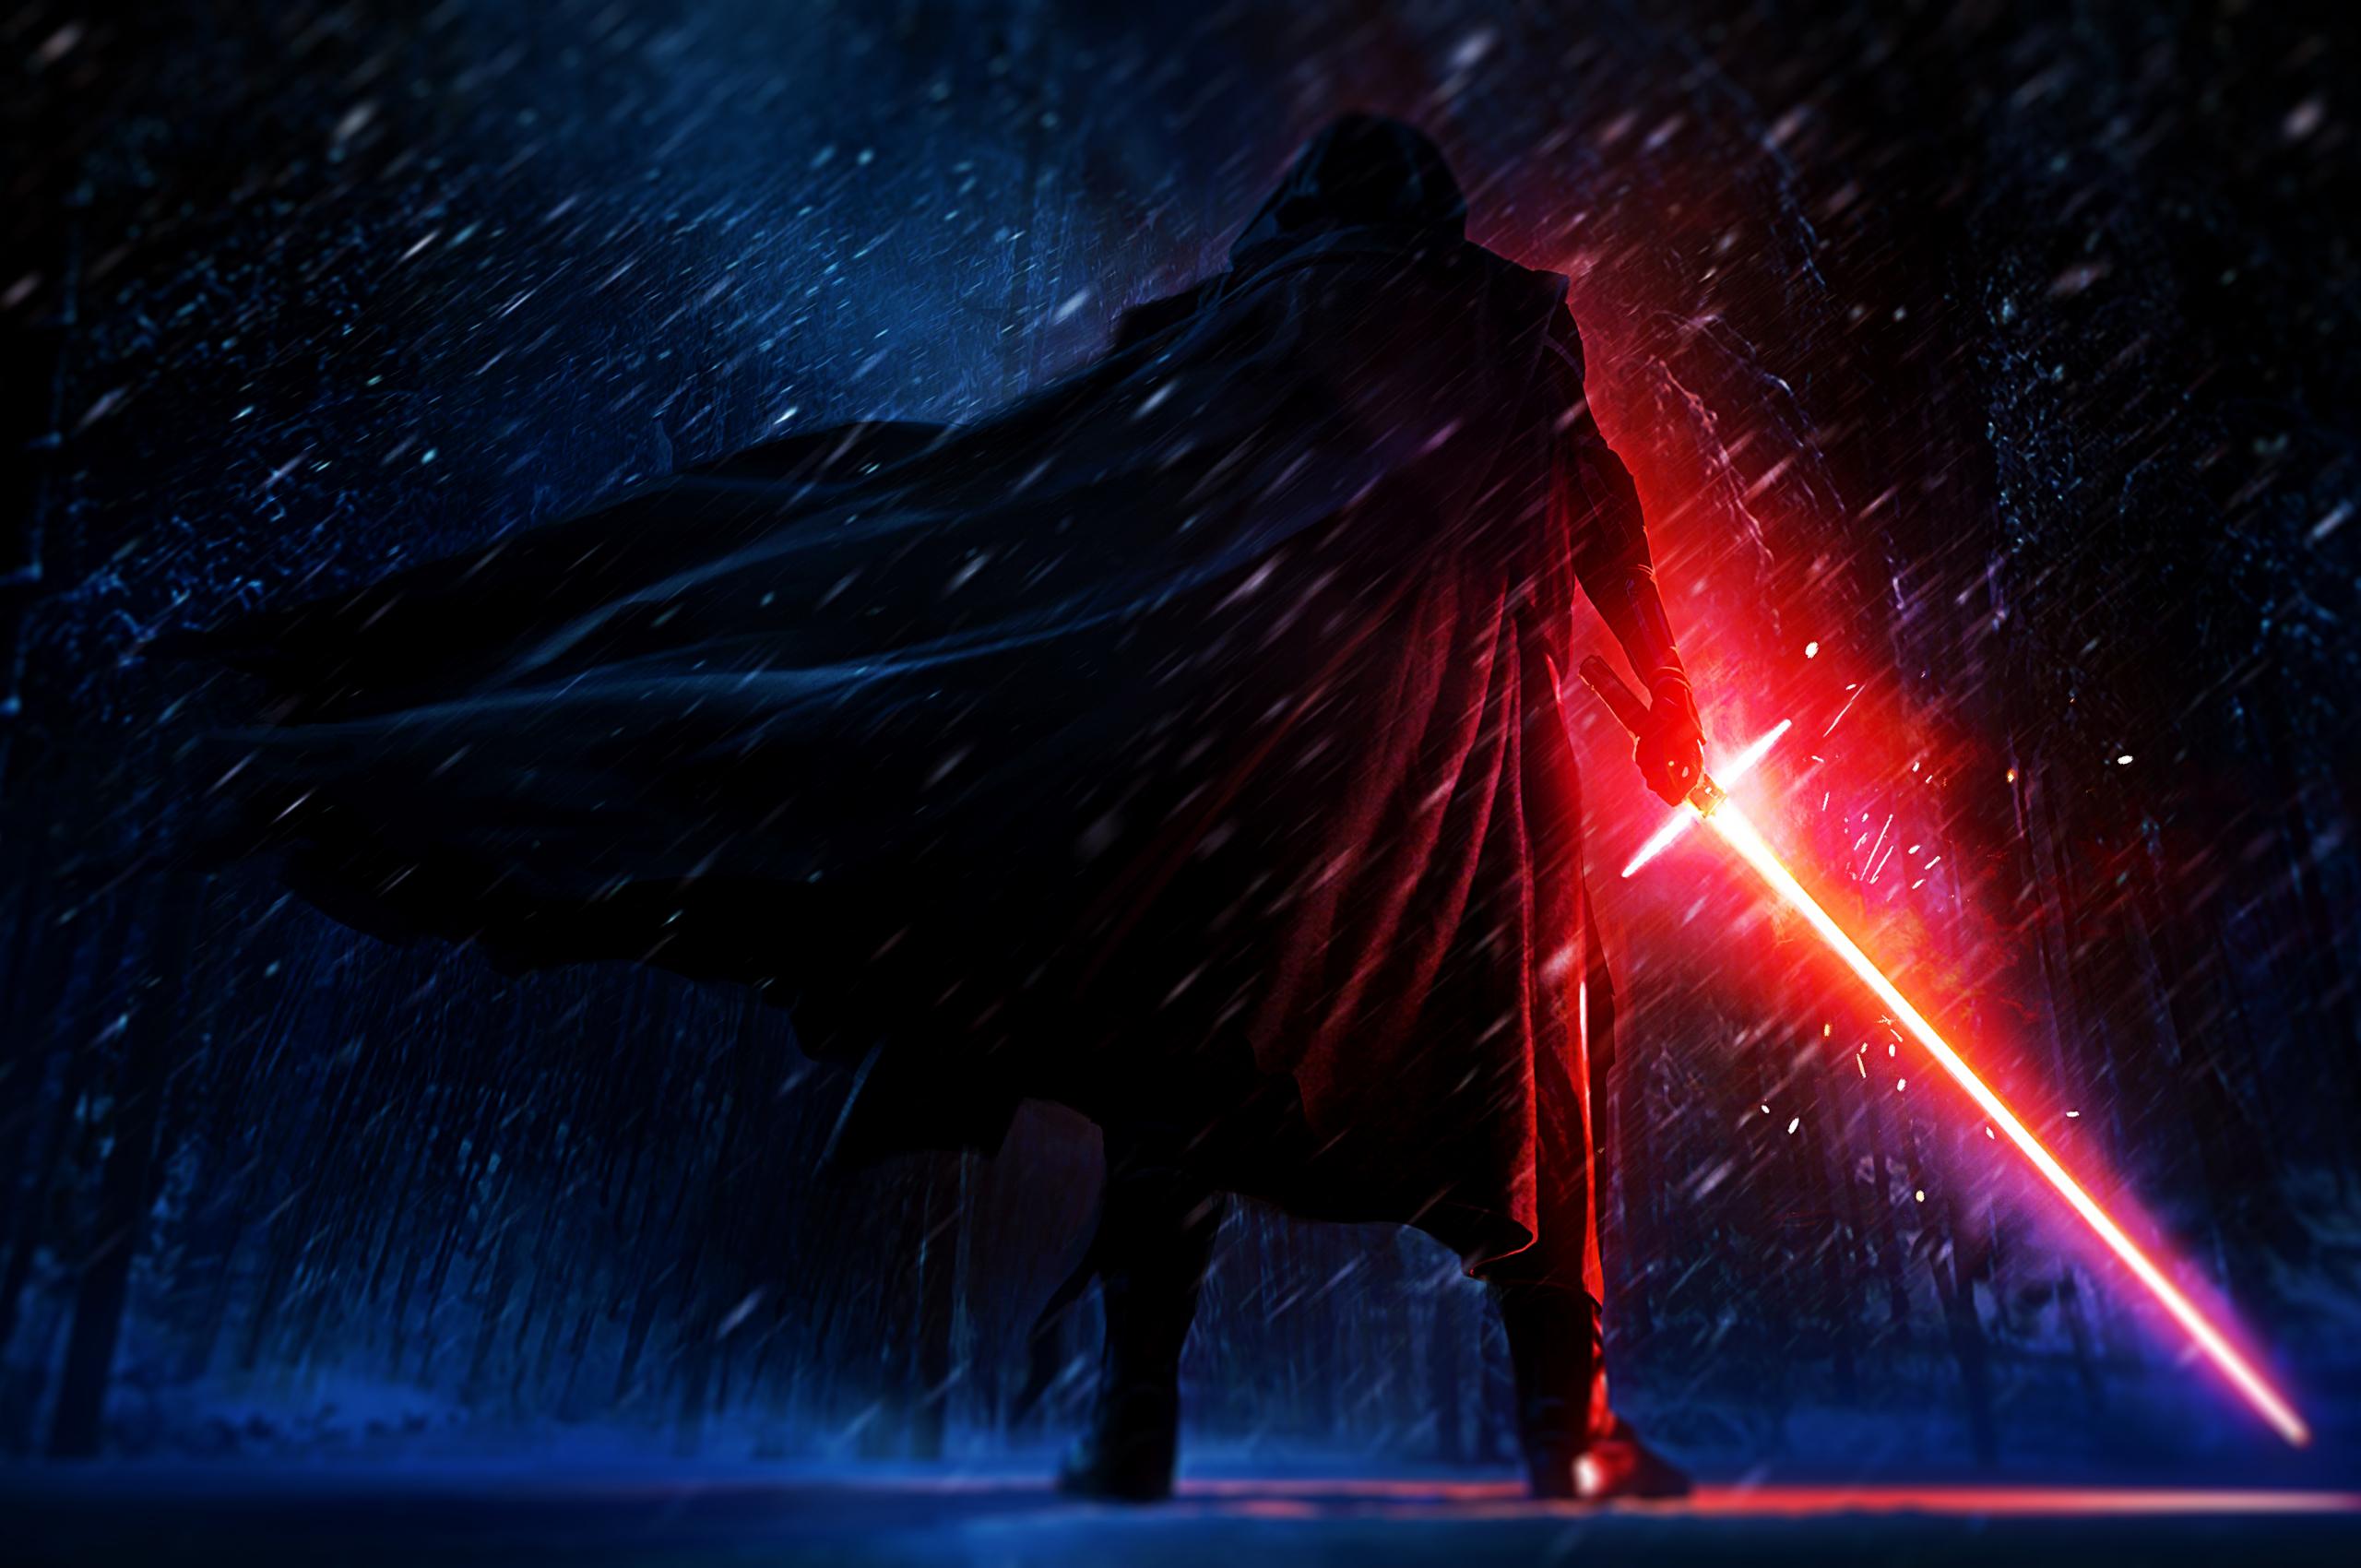 Free Download 4k Kylo Ren Star Wars Artwork Wallpaper By Nicolaslfbv On 3840x2160 For Your Desktop Mobile Tablet Explore 47 Star Wars 4k Wallpaper Star Wars Desktop Wallpaper Star